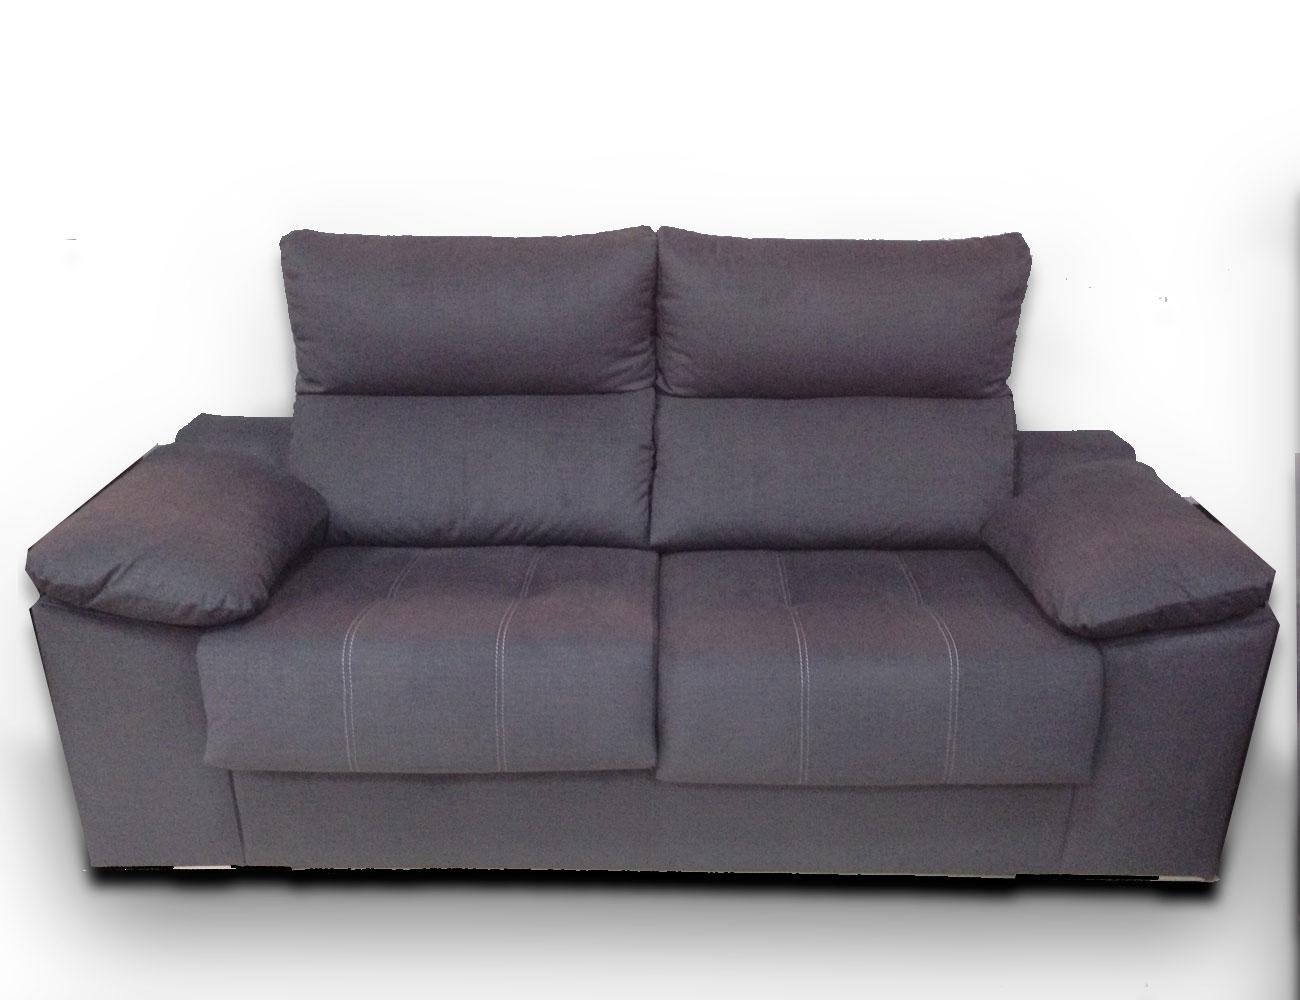 Sofa 3 plazas7